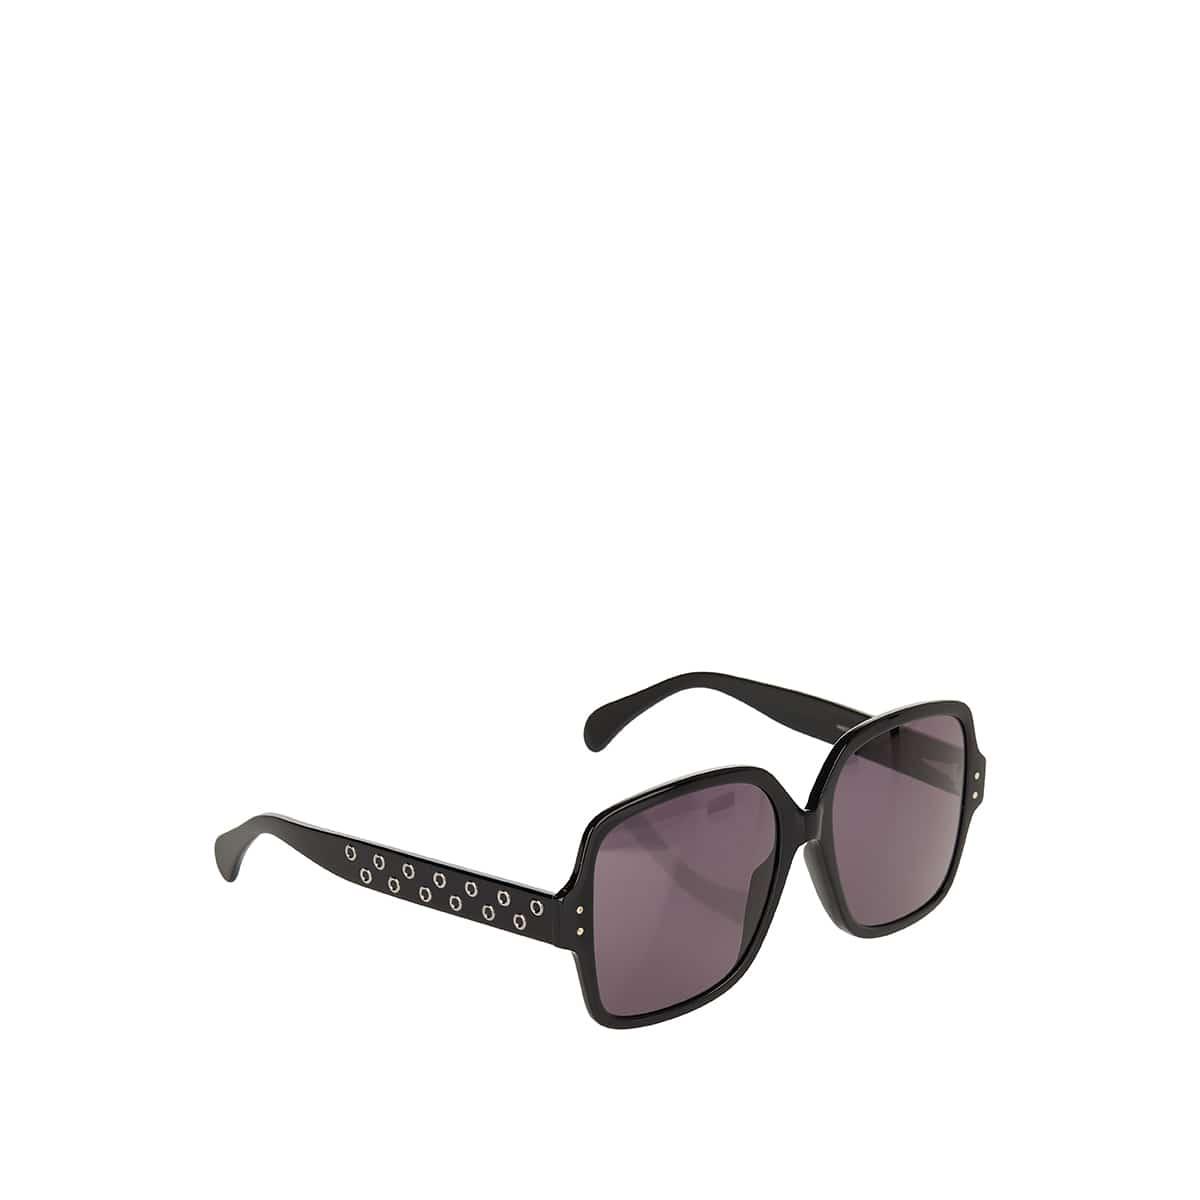 Studded oversized sunglasses